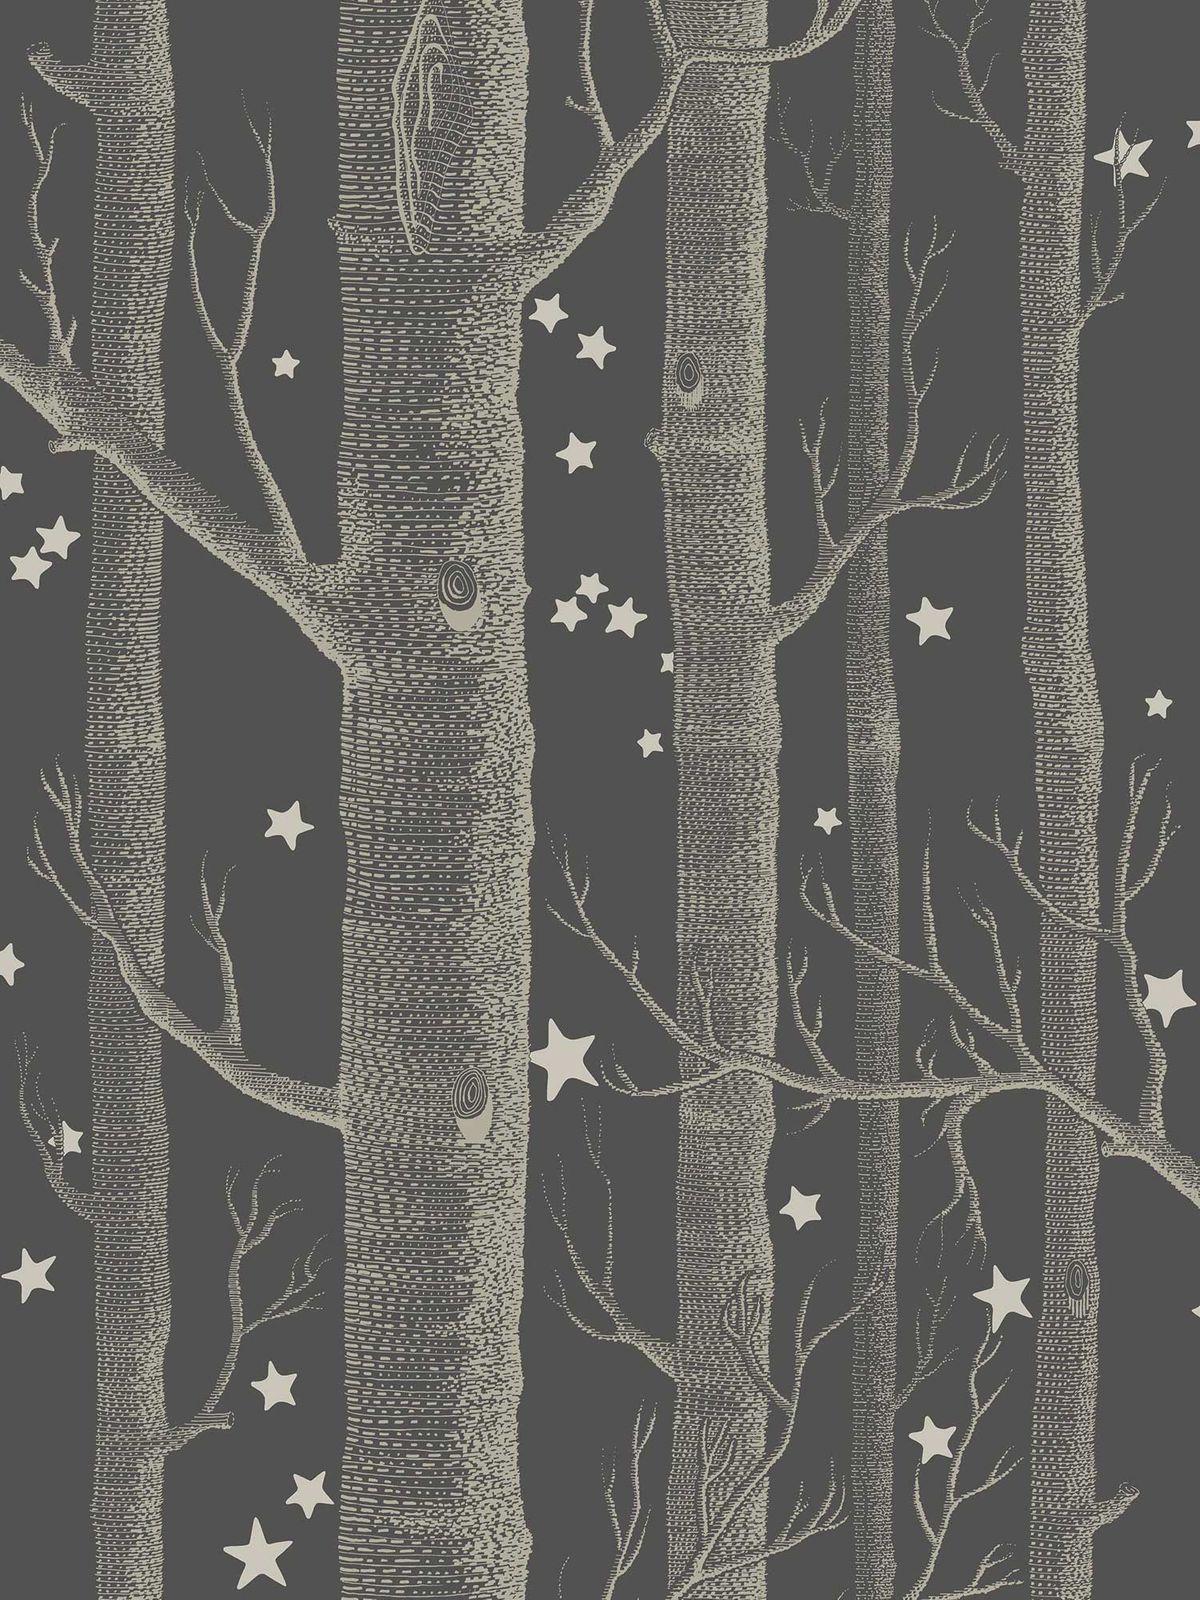 whimsical-woods-wallpaper